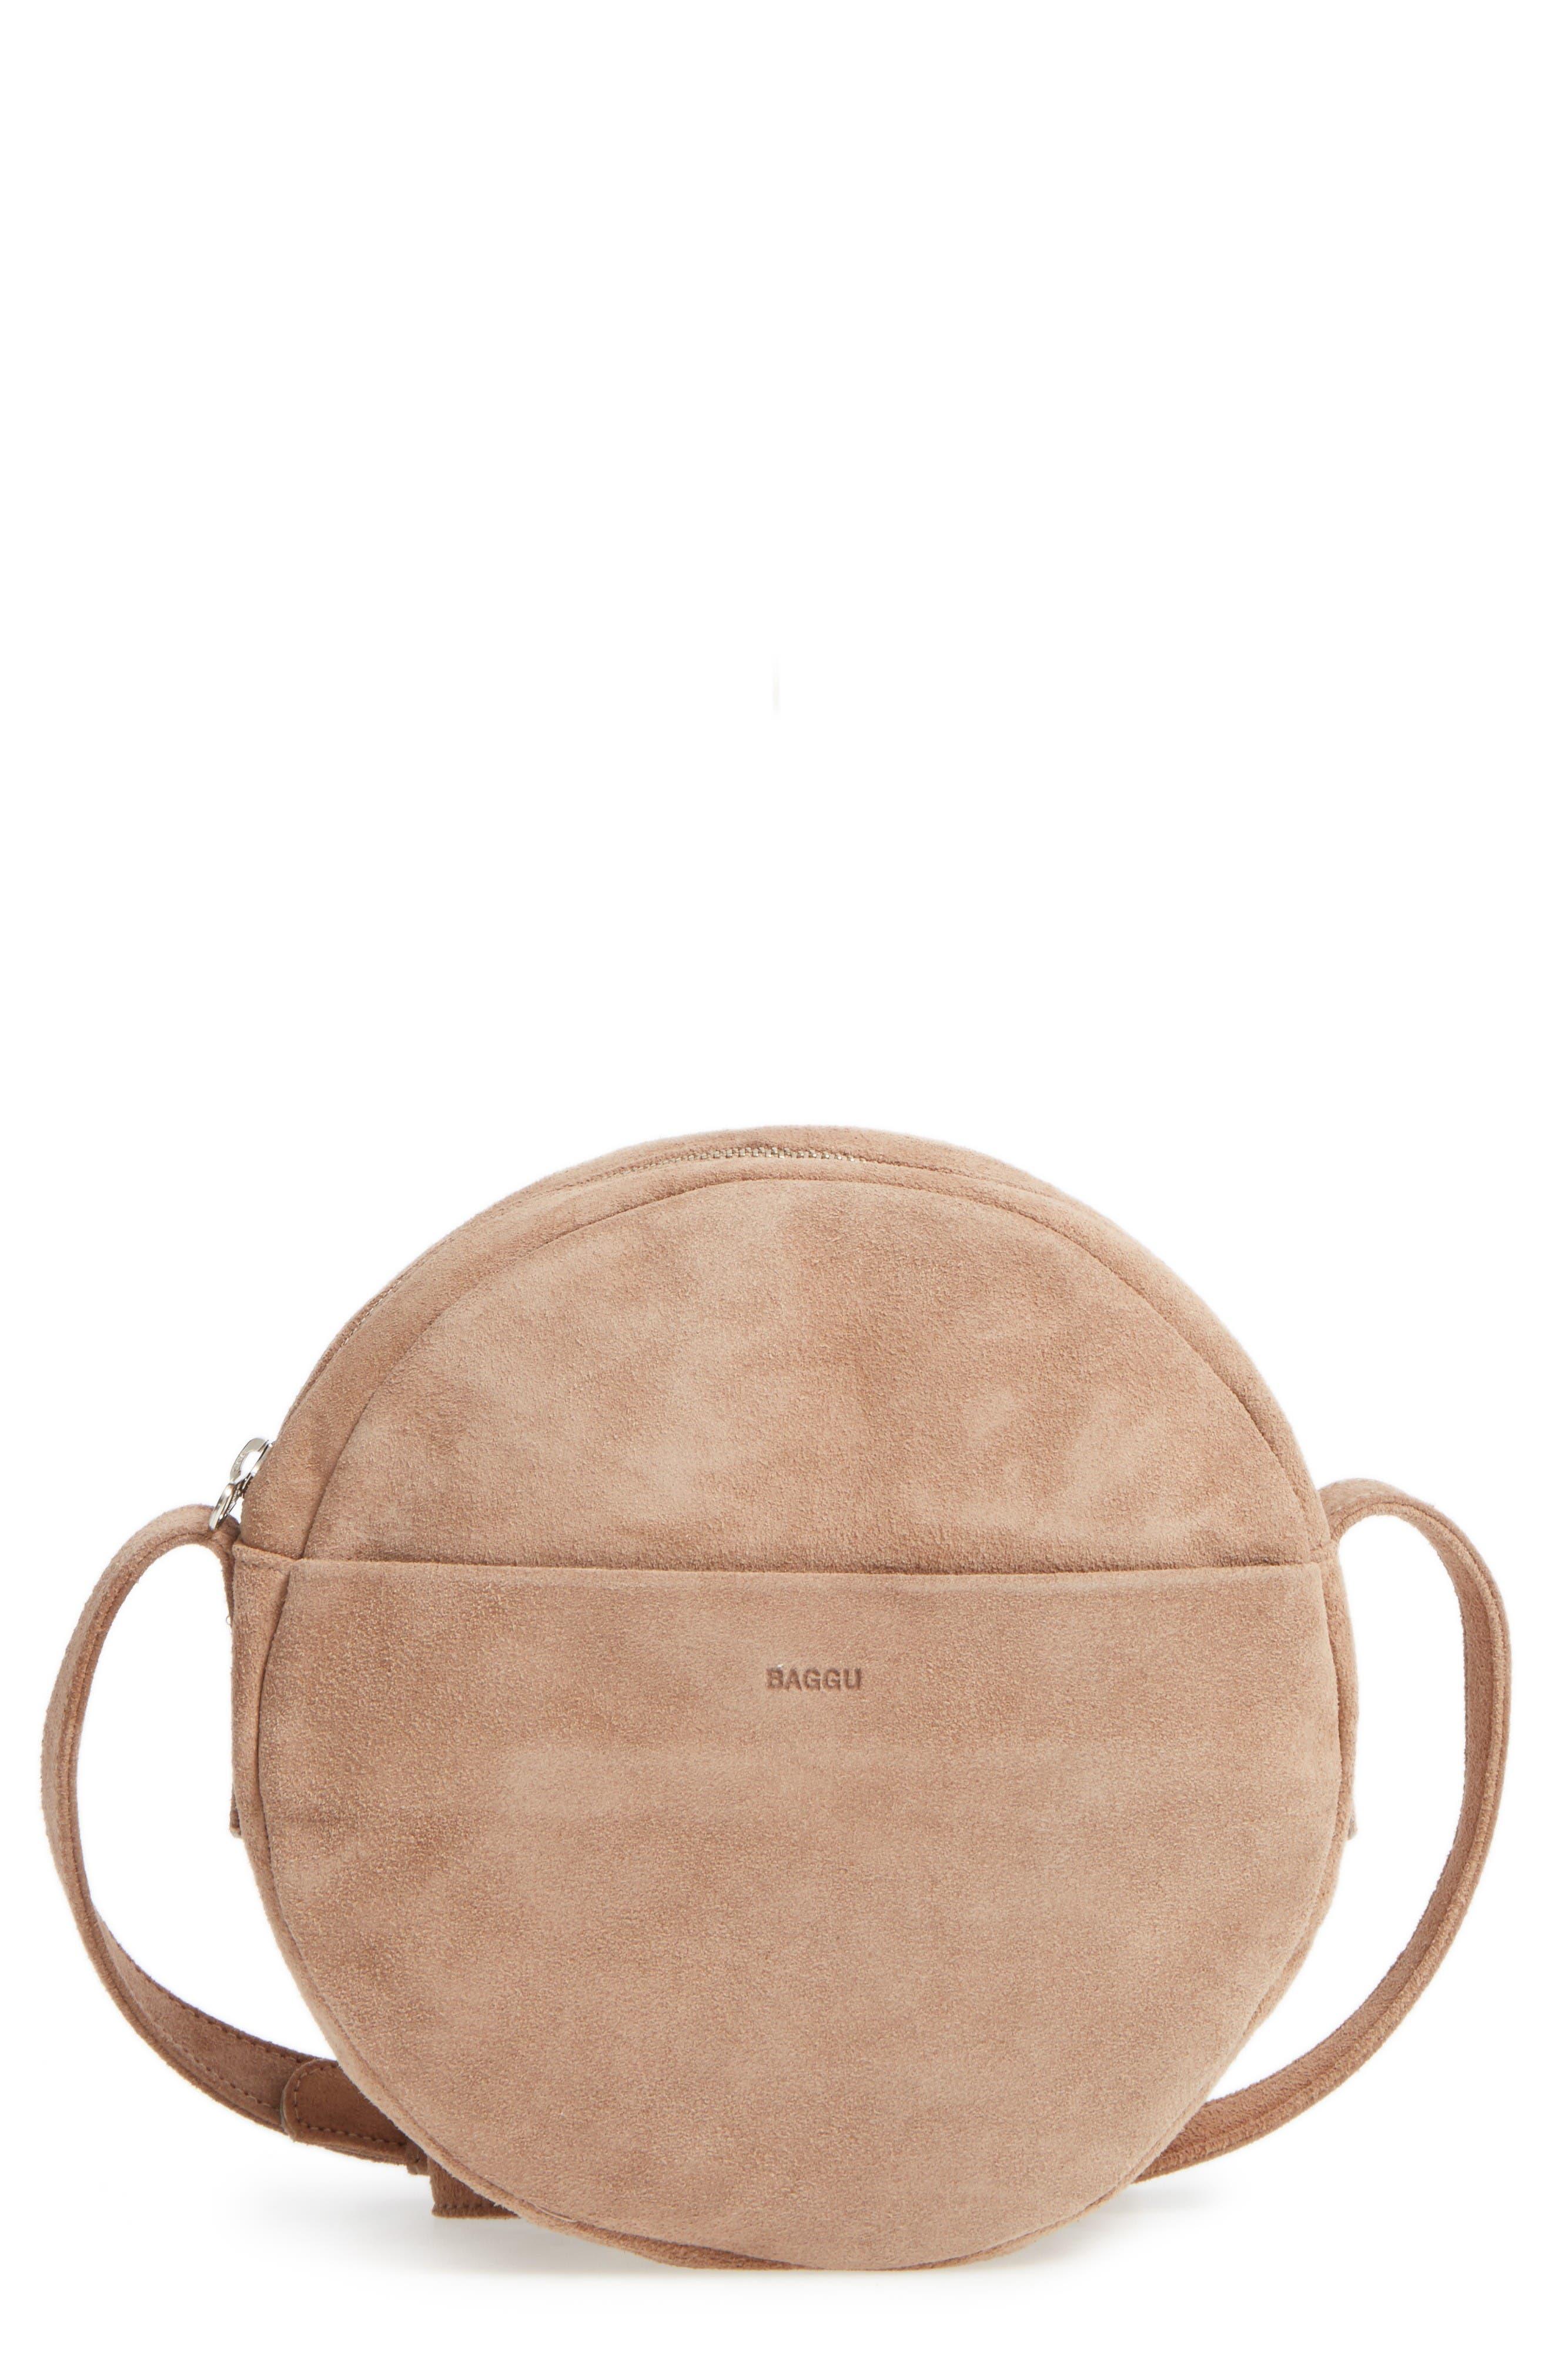 Baggu Pebbled Leather Crossbody Bag